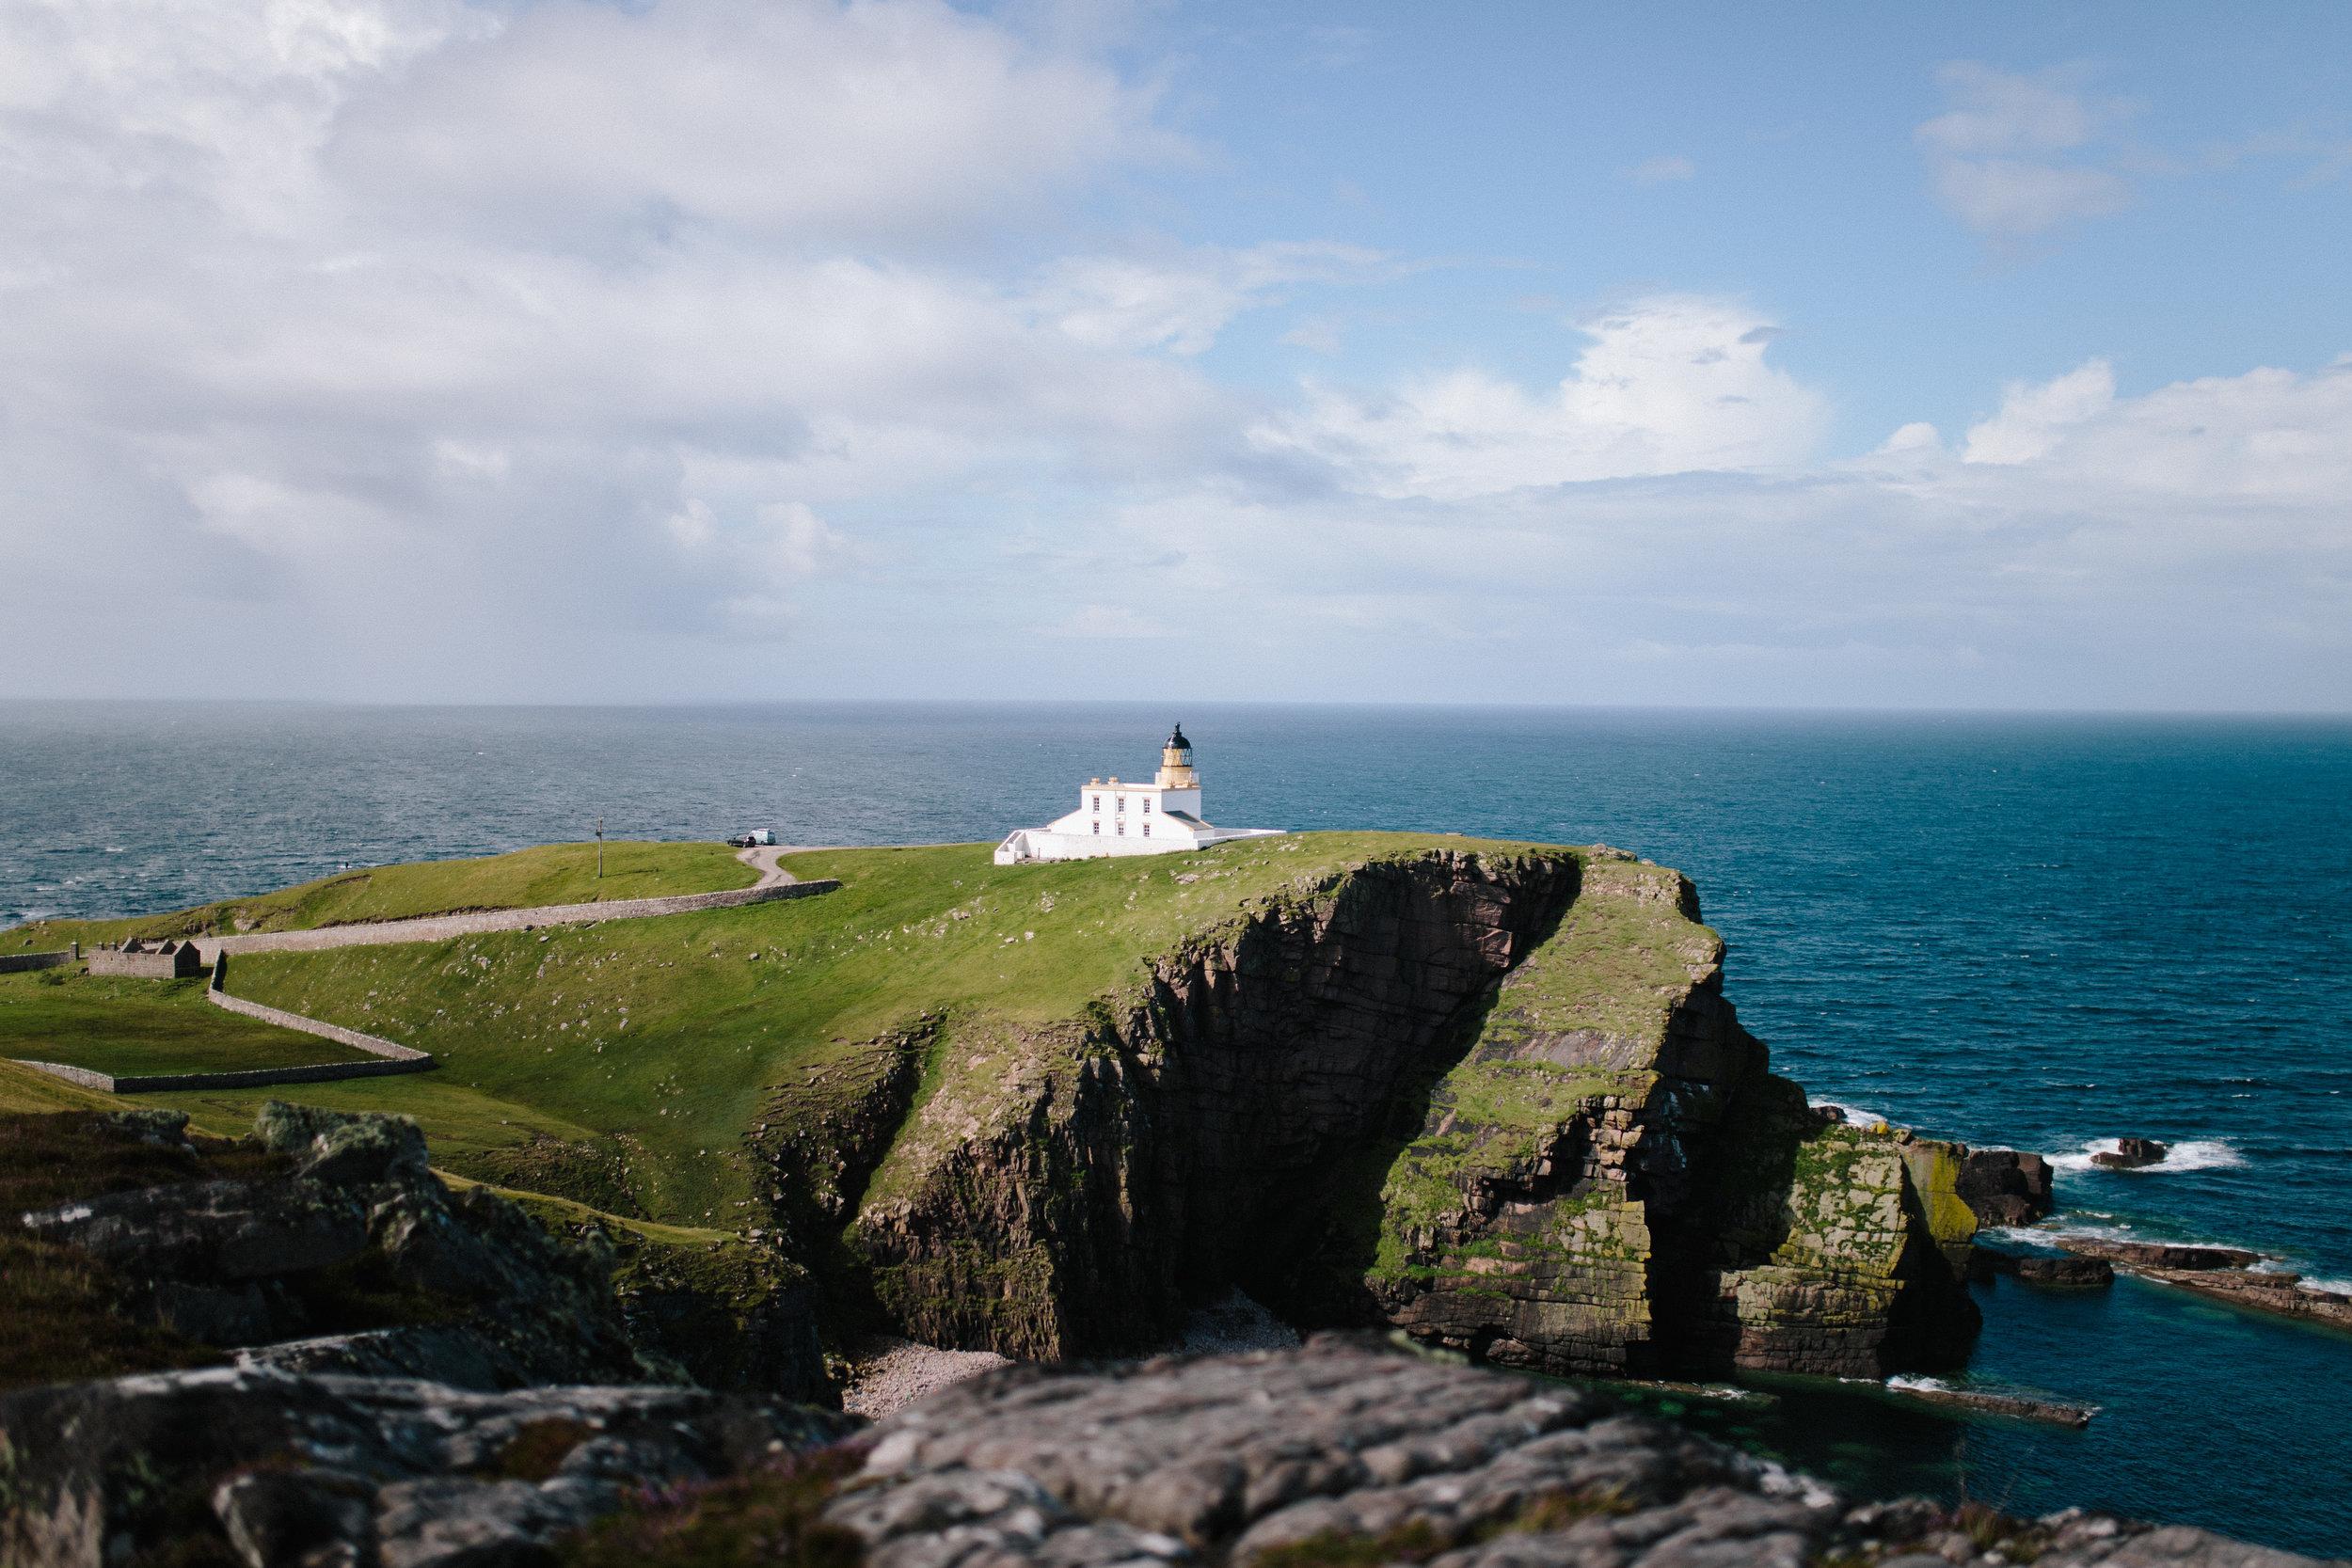 Stoer Head Lighthouse, 2017